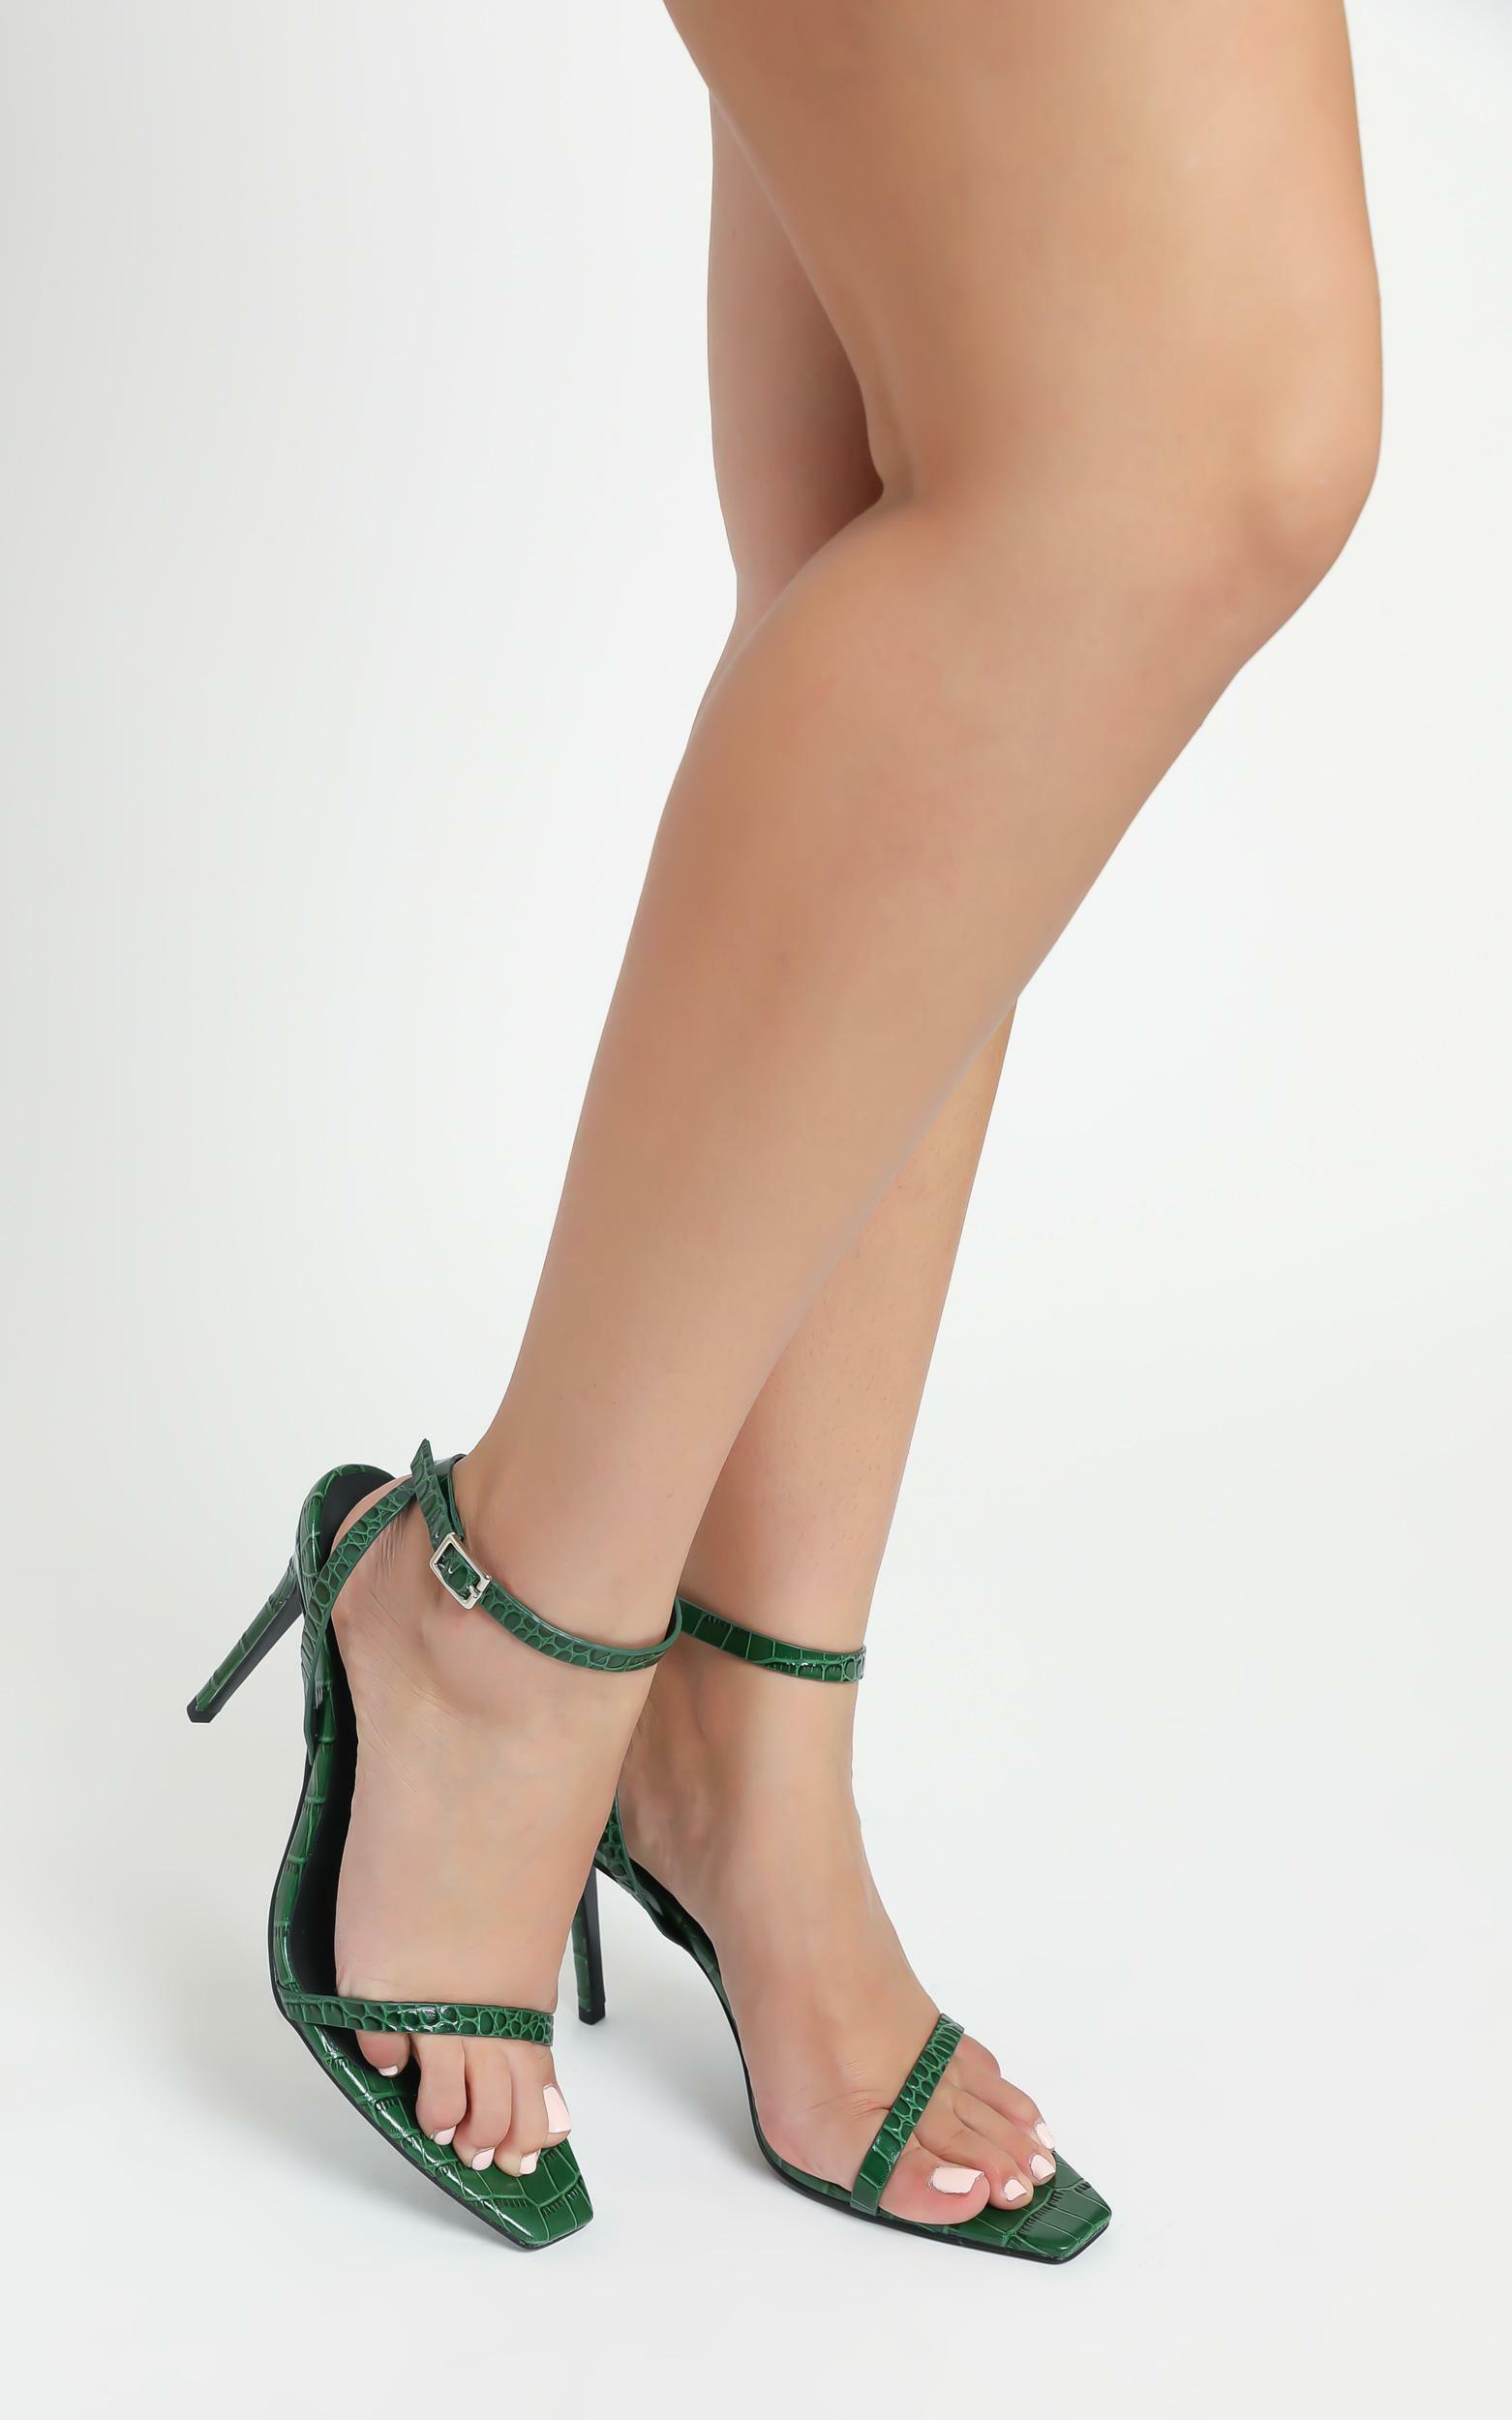 Alias Mae - Isaac Heels in Green Croc - 5.5, Green, hi-res image number null